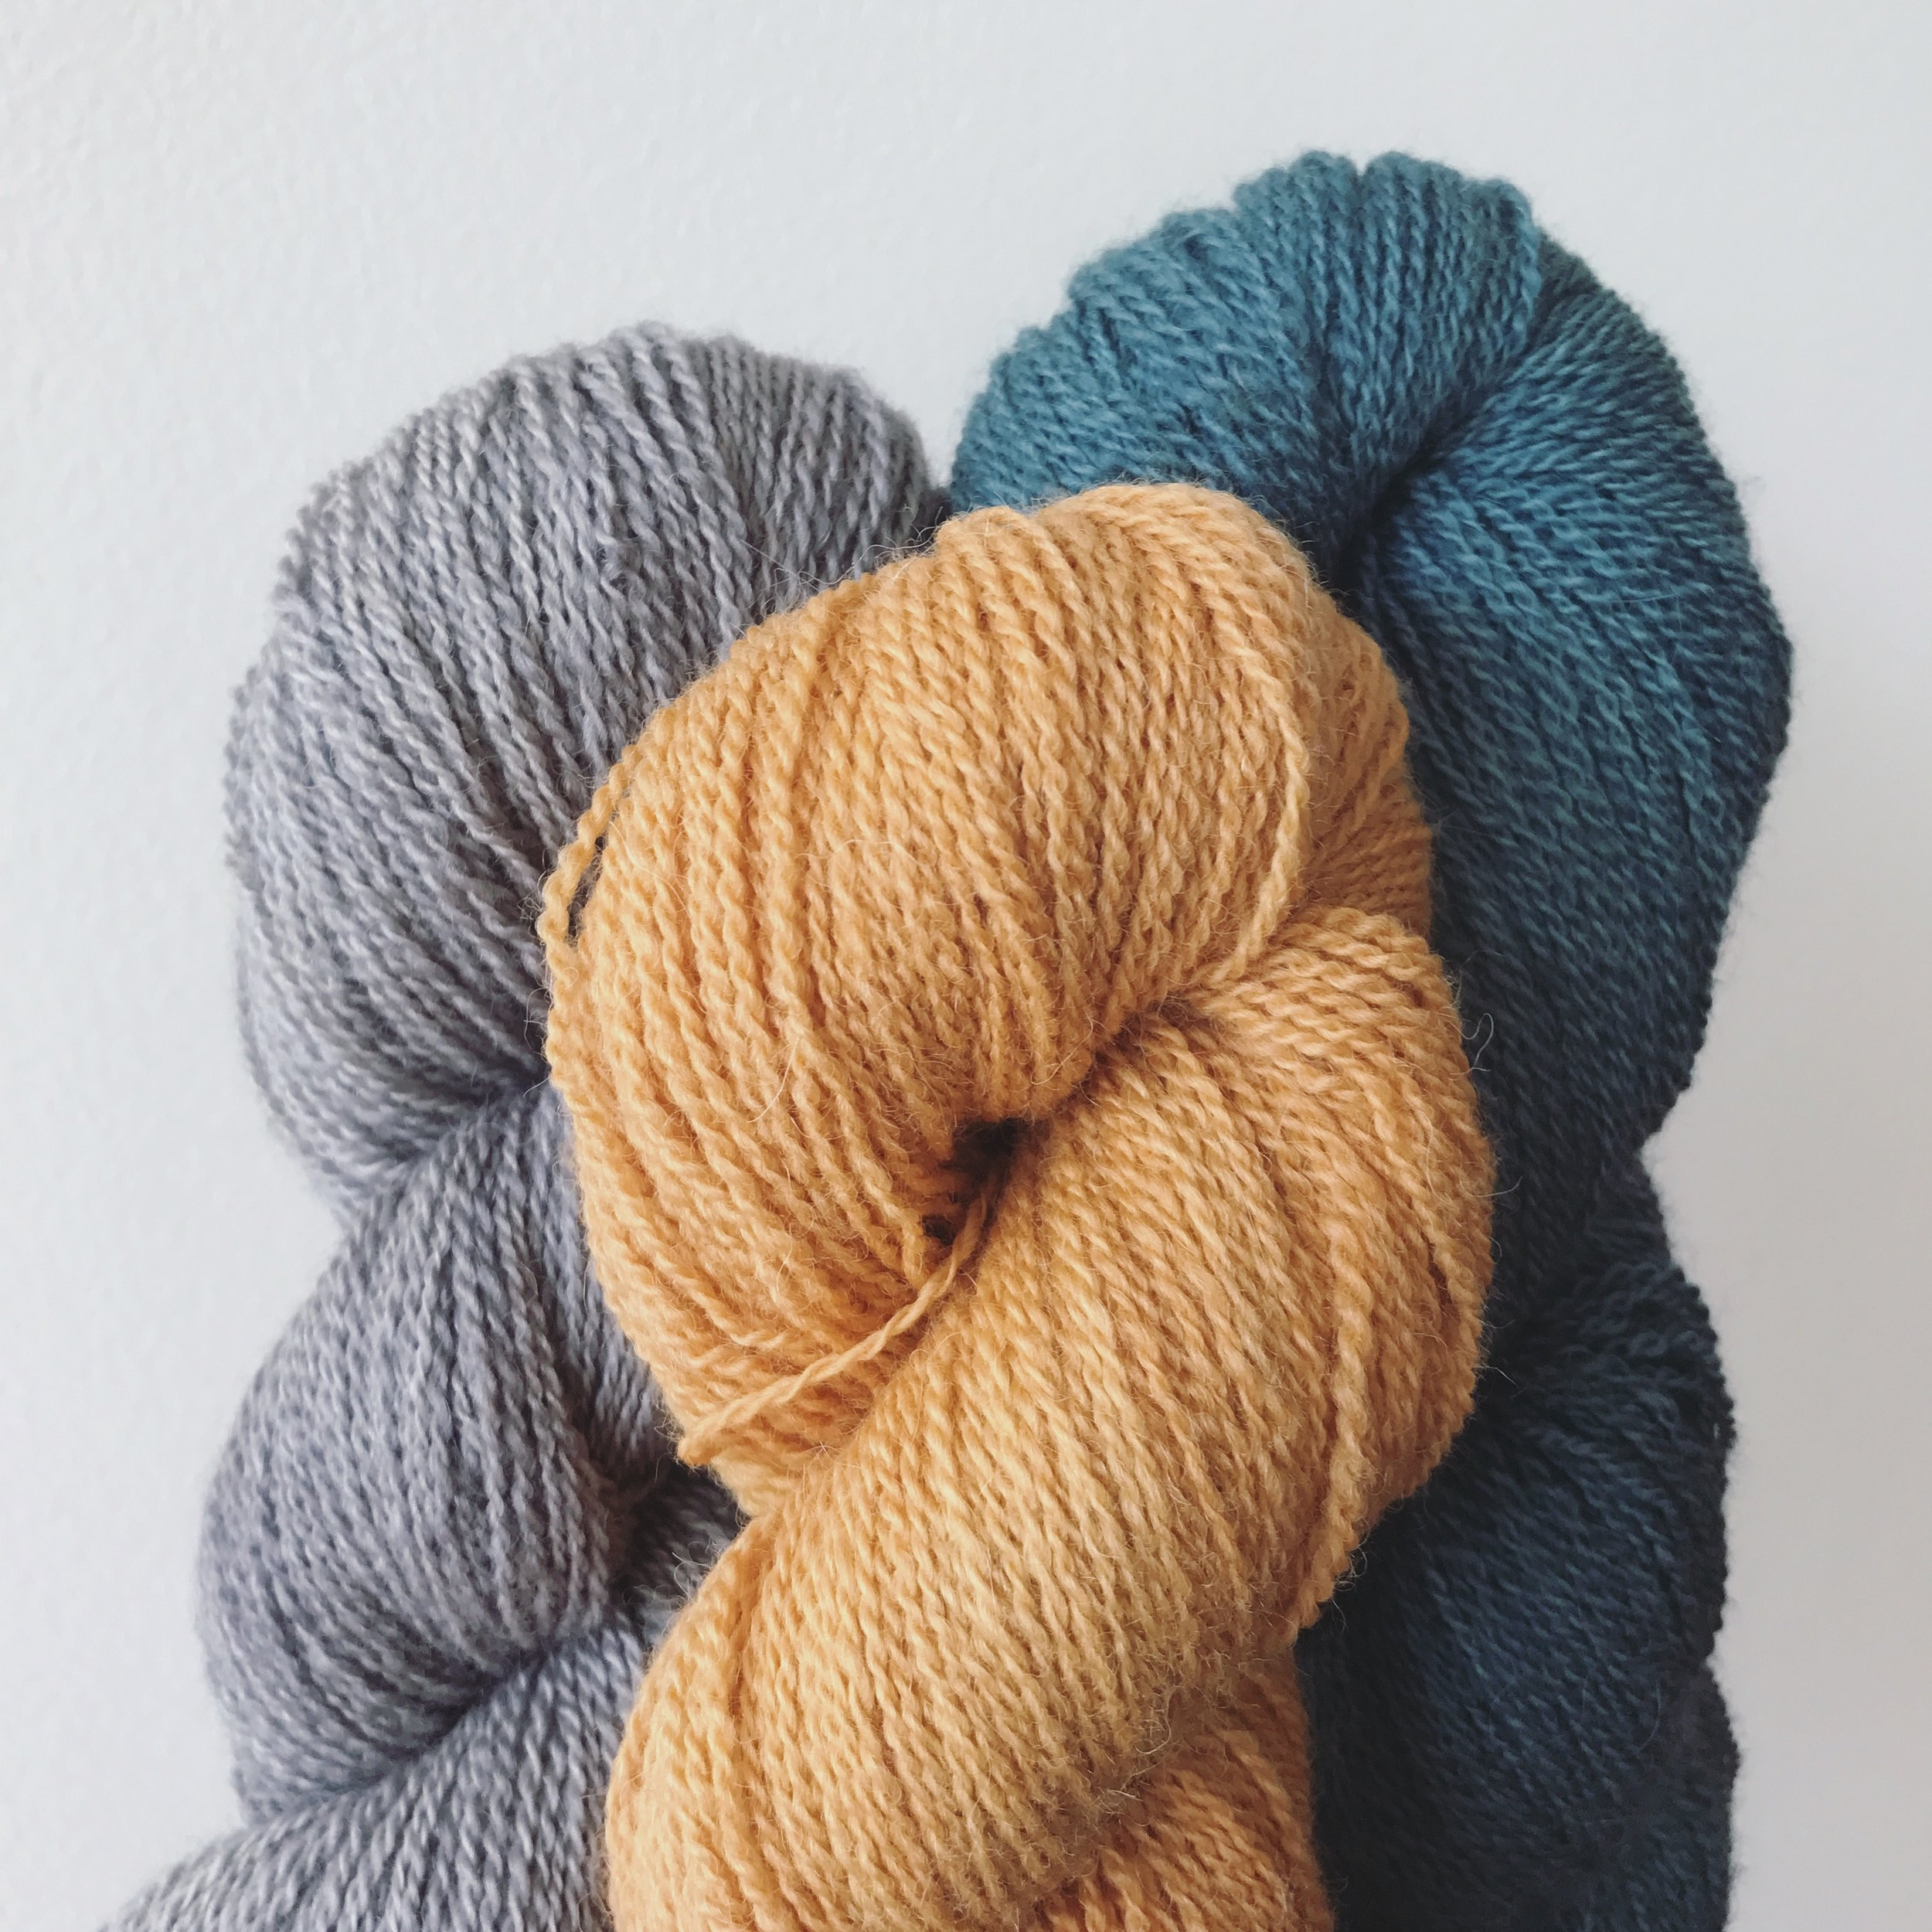 Why Knot, Smitten, Silver, Ripple, & Coreopsis Image © Firefly Fiber Arts Studio